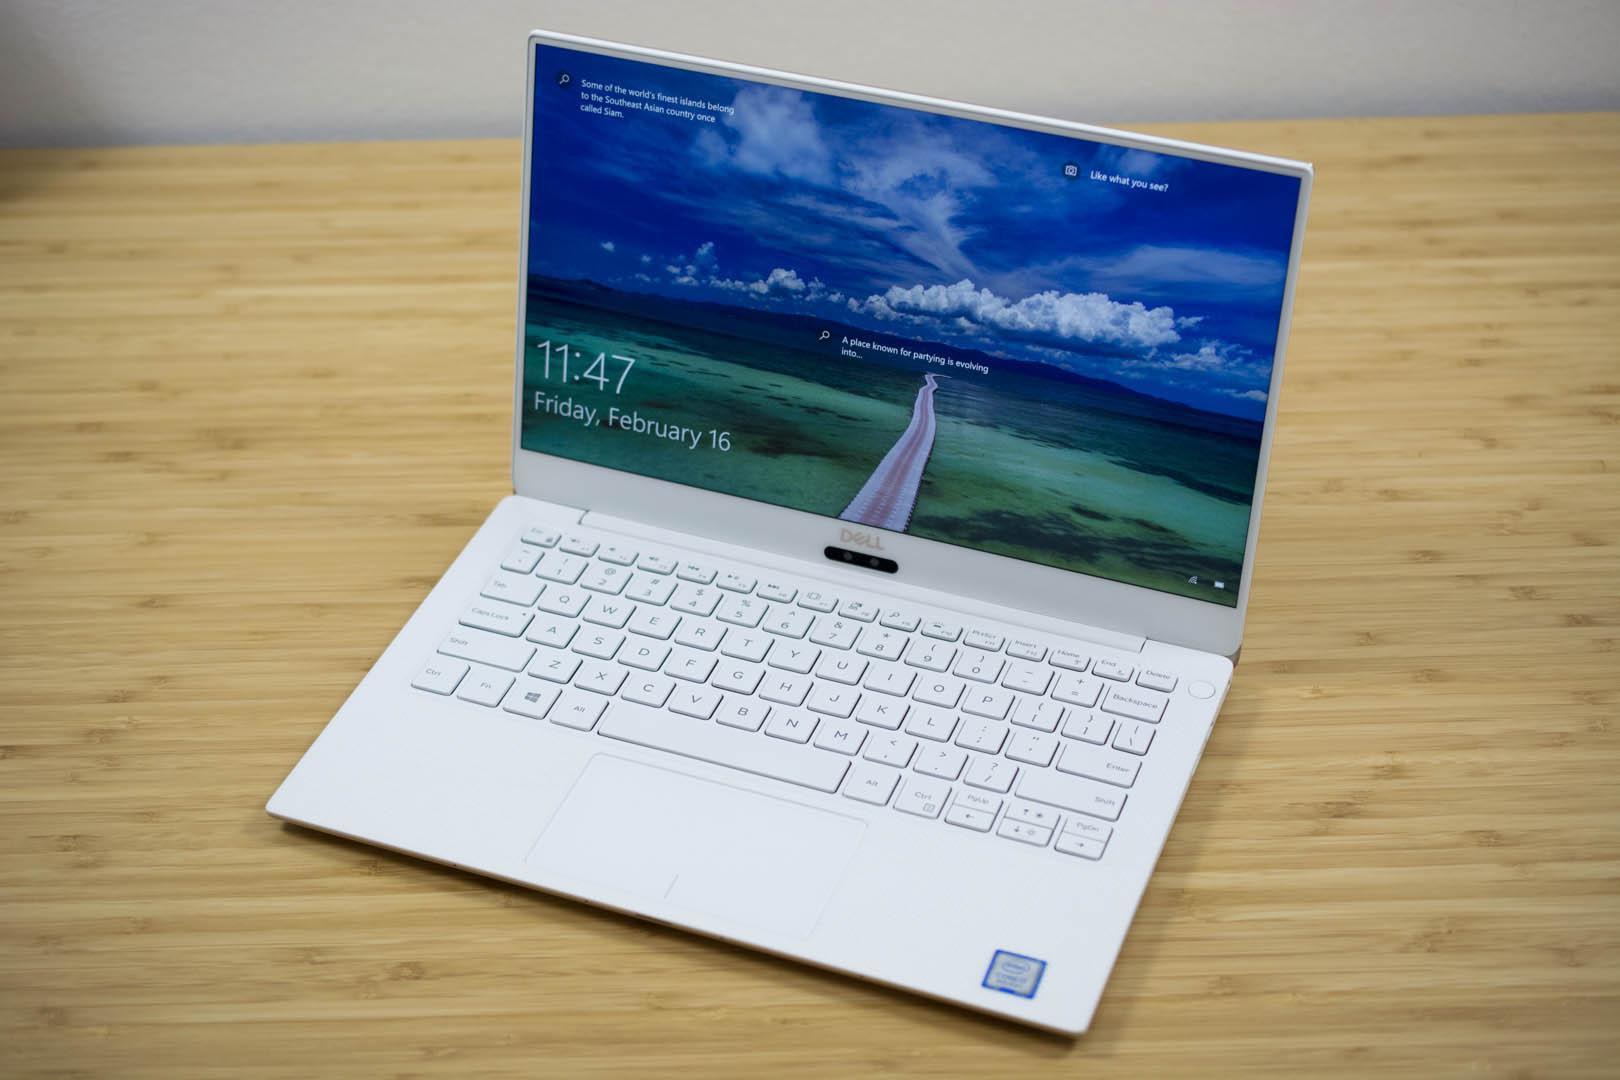 XPS 13 2018 Review Dells Improvements Propel This Laptop Forward Enlarge